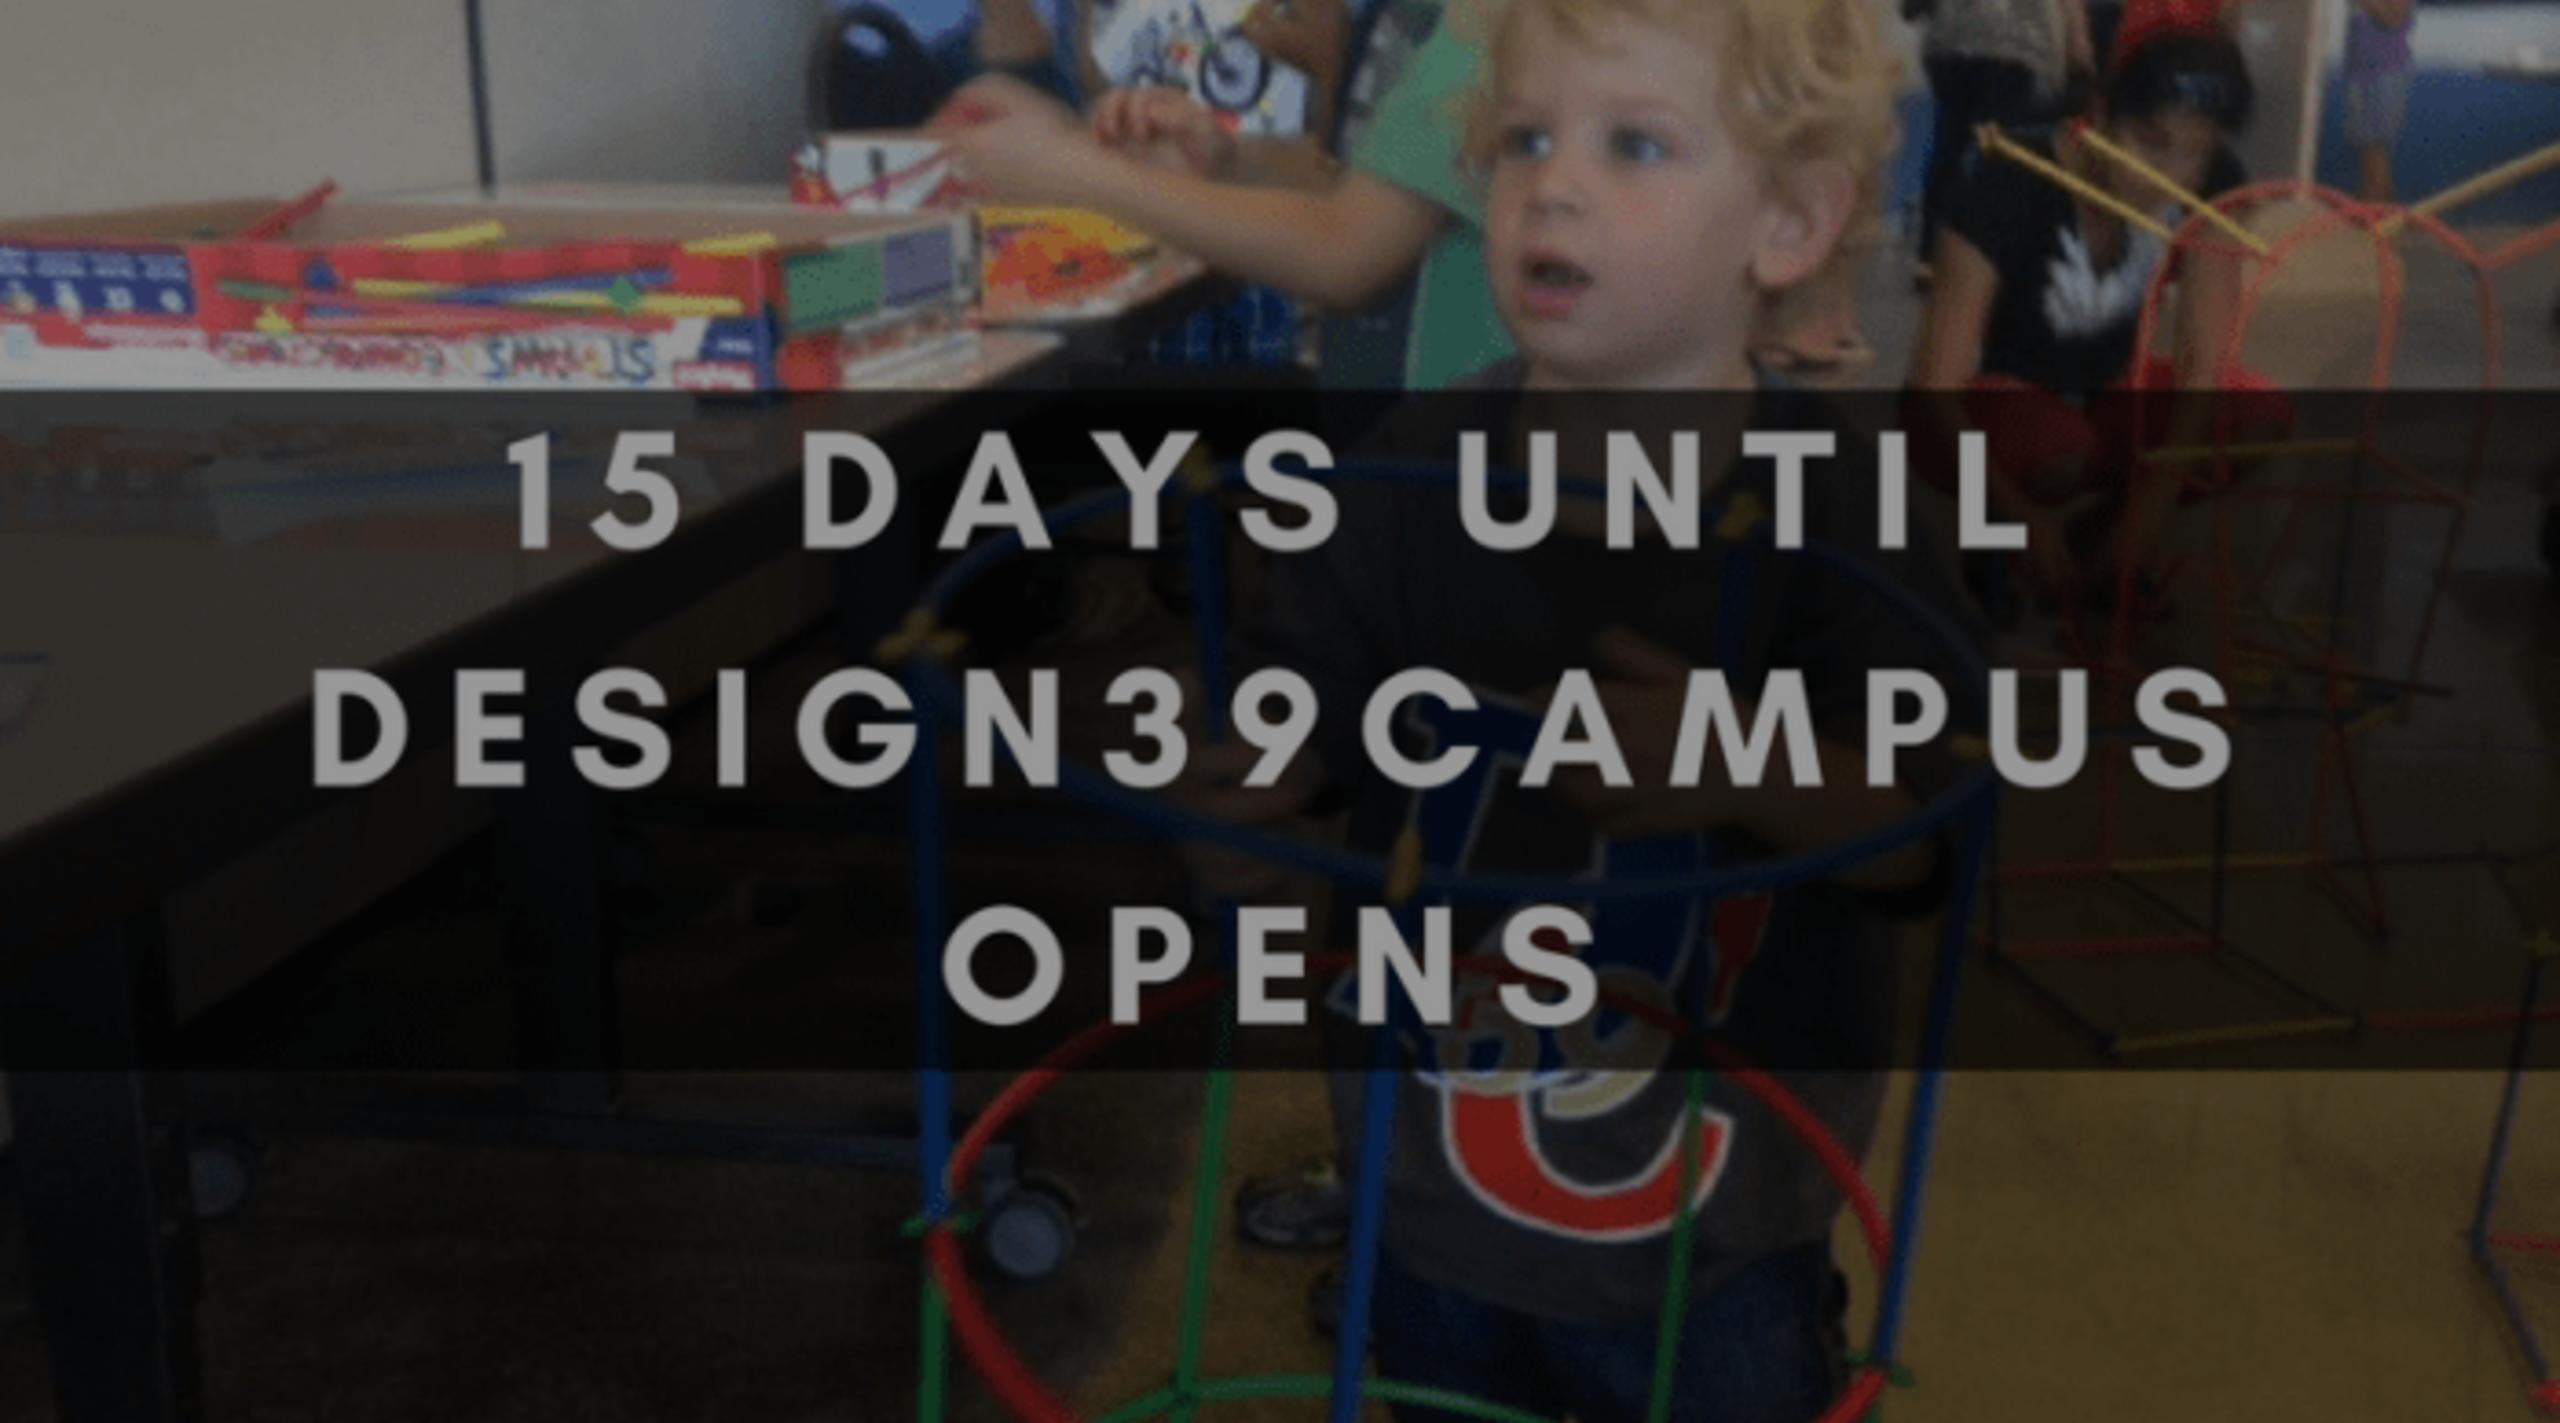 15 DAYS UNTIL DESIGN39CAMPUS OPENS